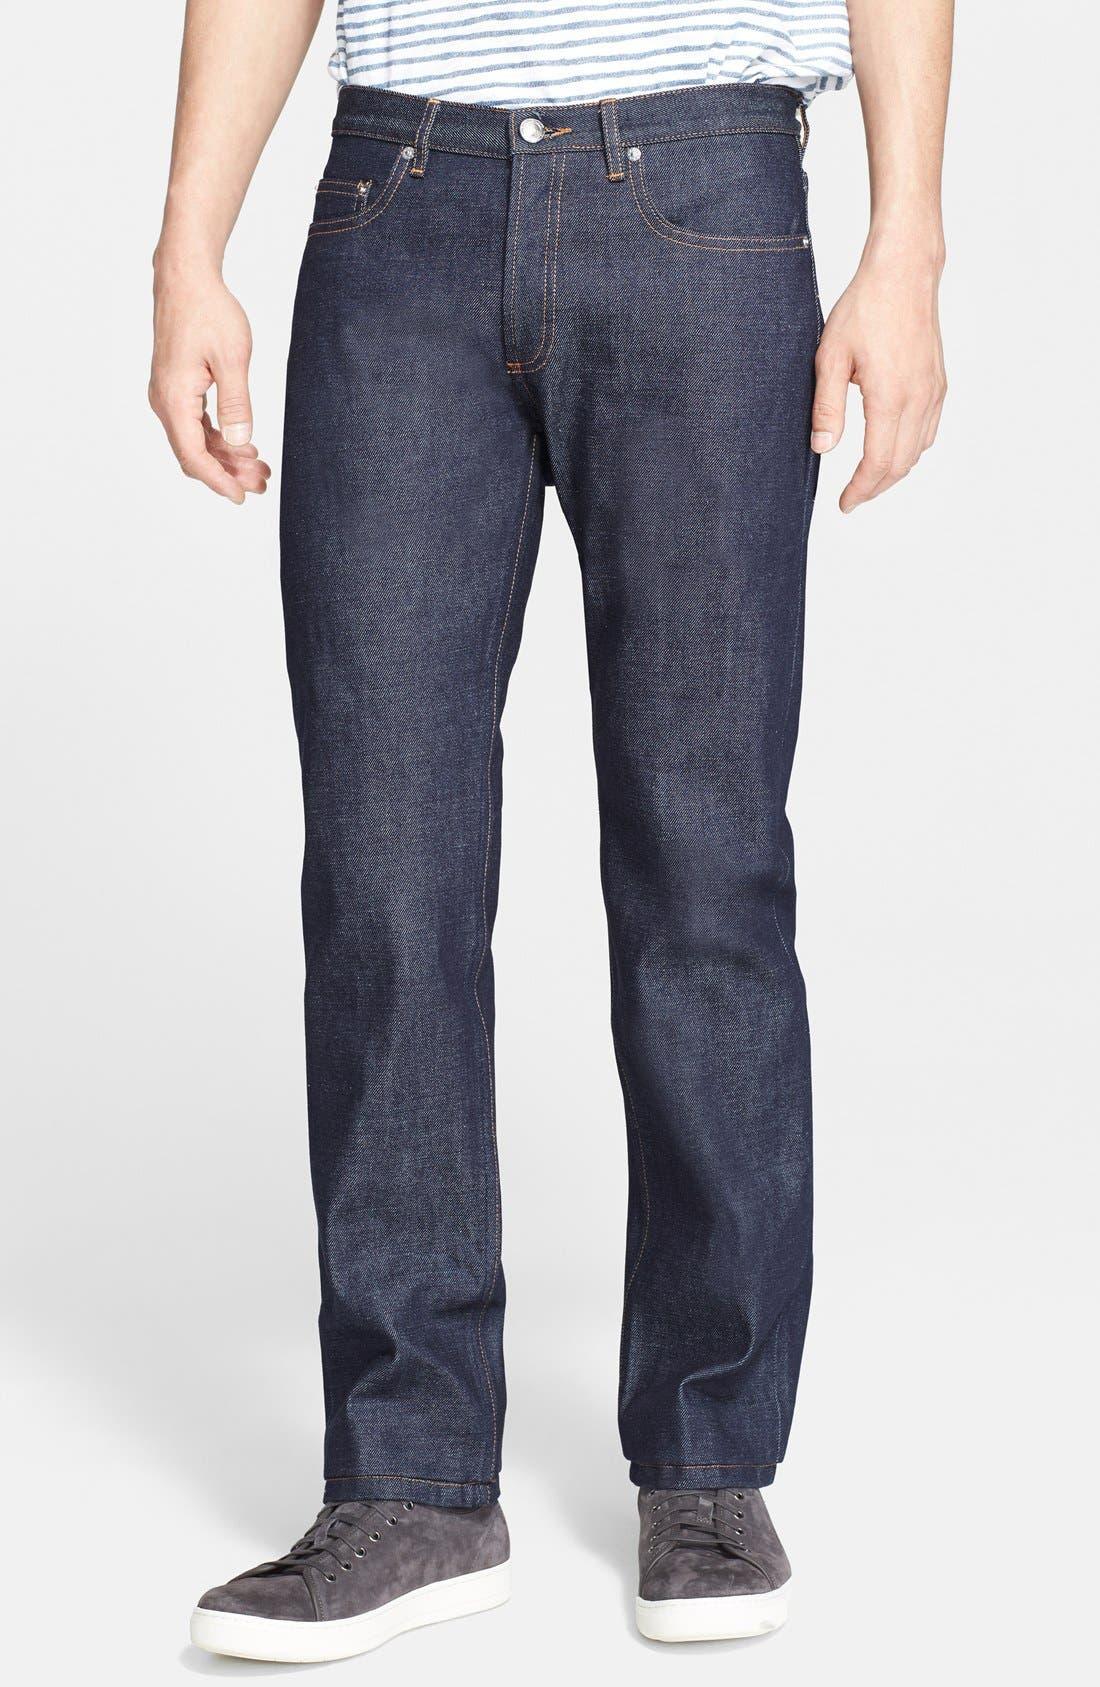 A.P.C. New Standard Slim Straight Leg Selvedge Jeans